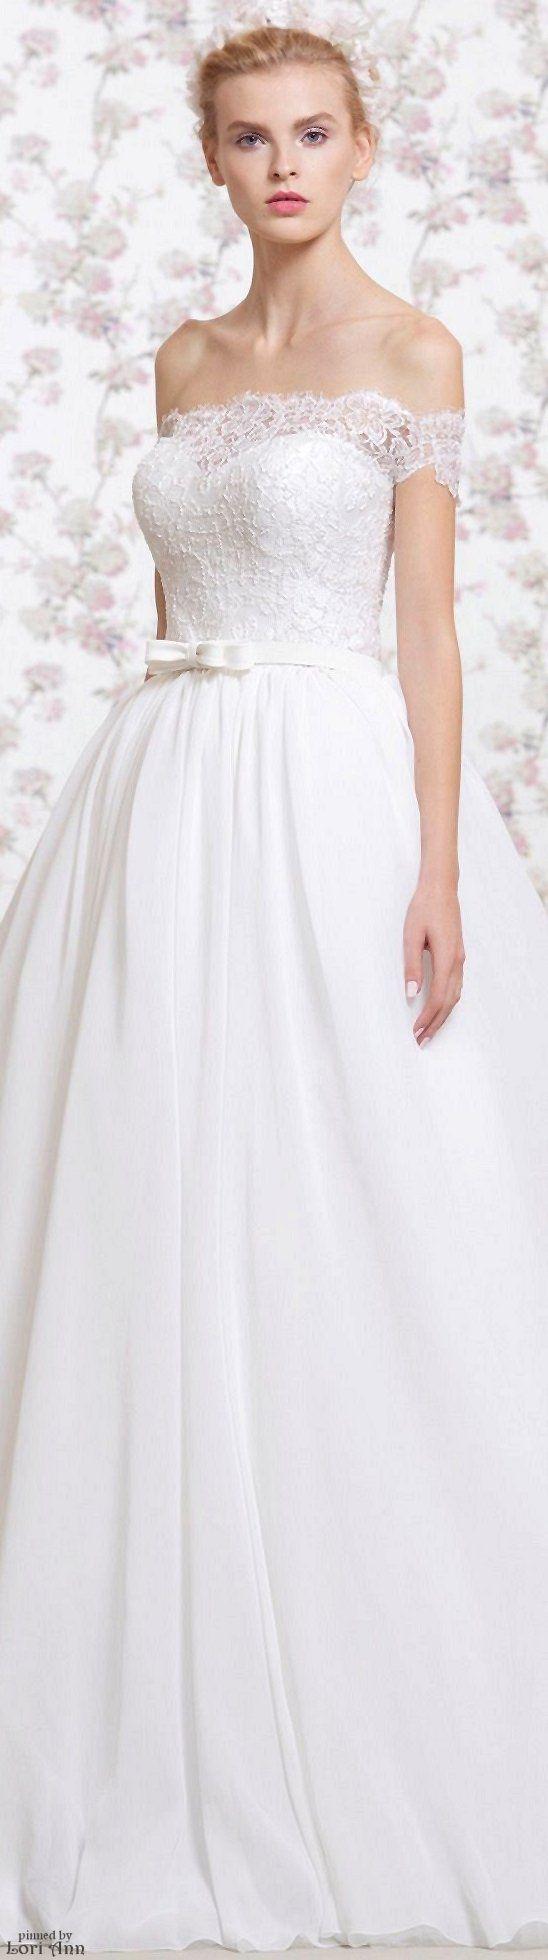 Georges Hobeika Bridal Spring 2016 Wedding Dresses Only